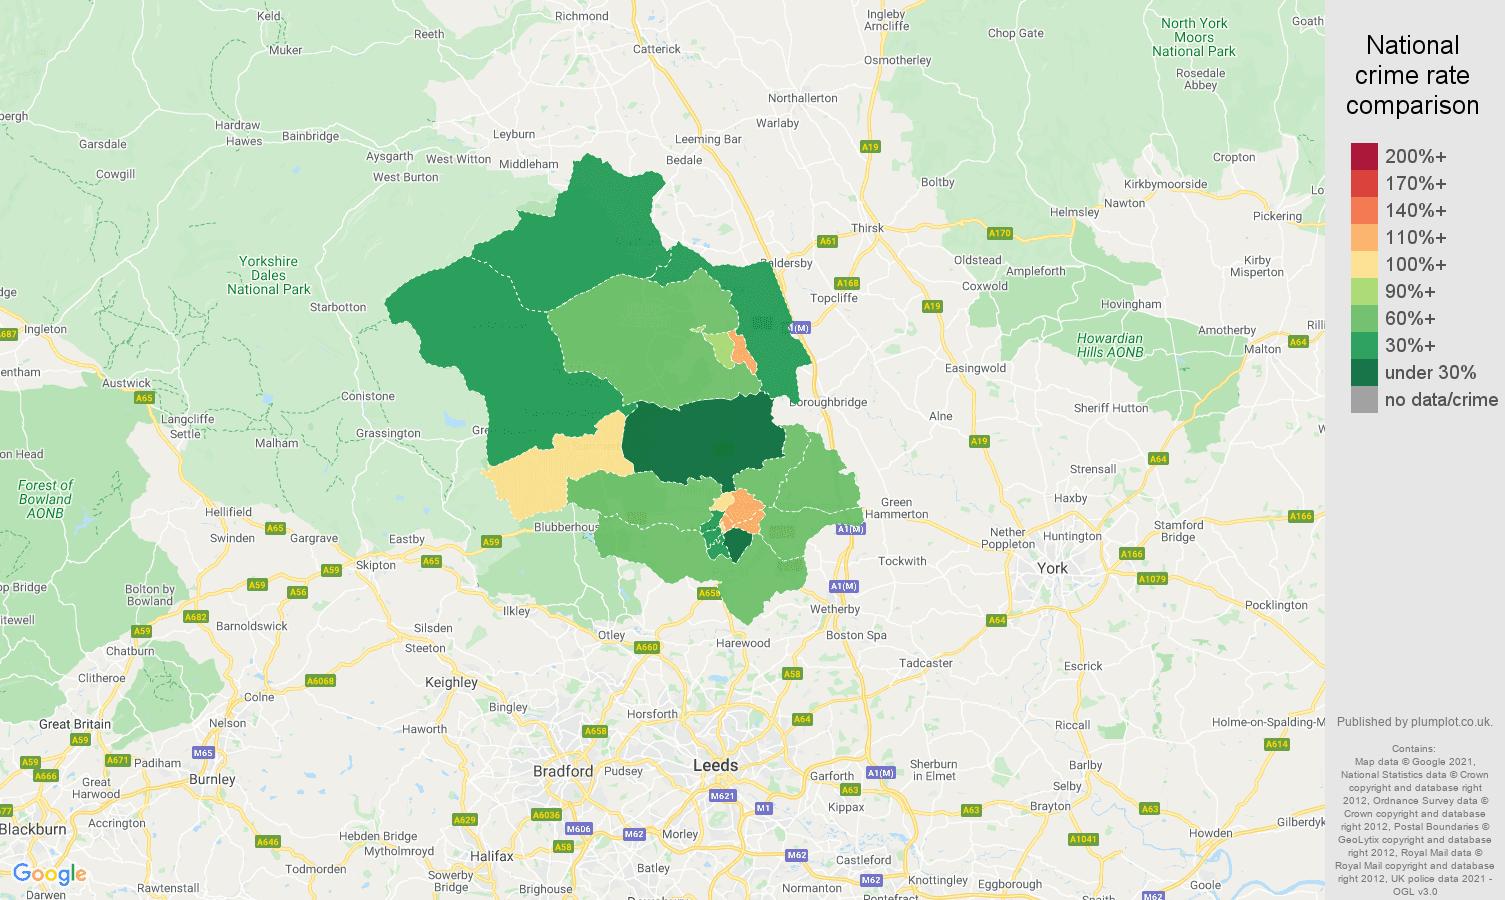 Harrogate criminal damage and arson crime rate comparison map